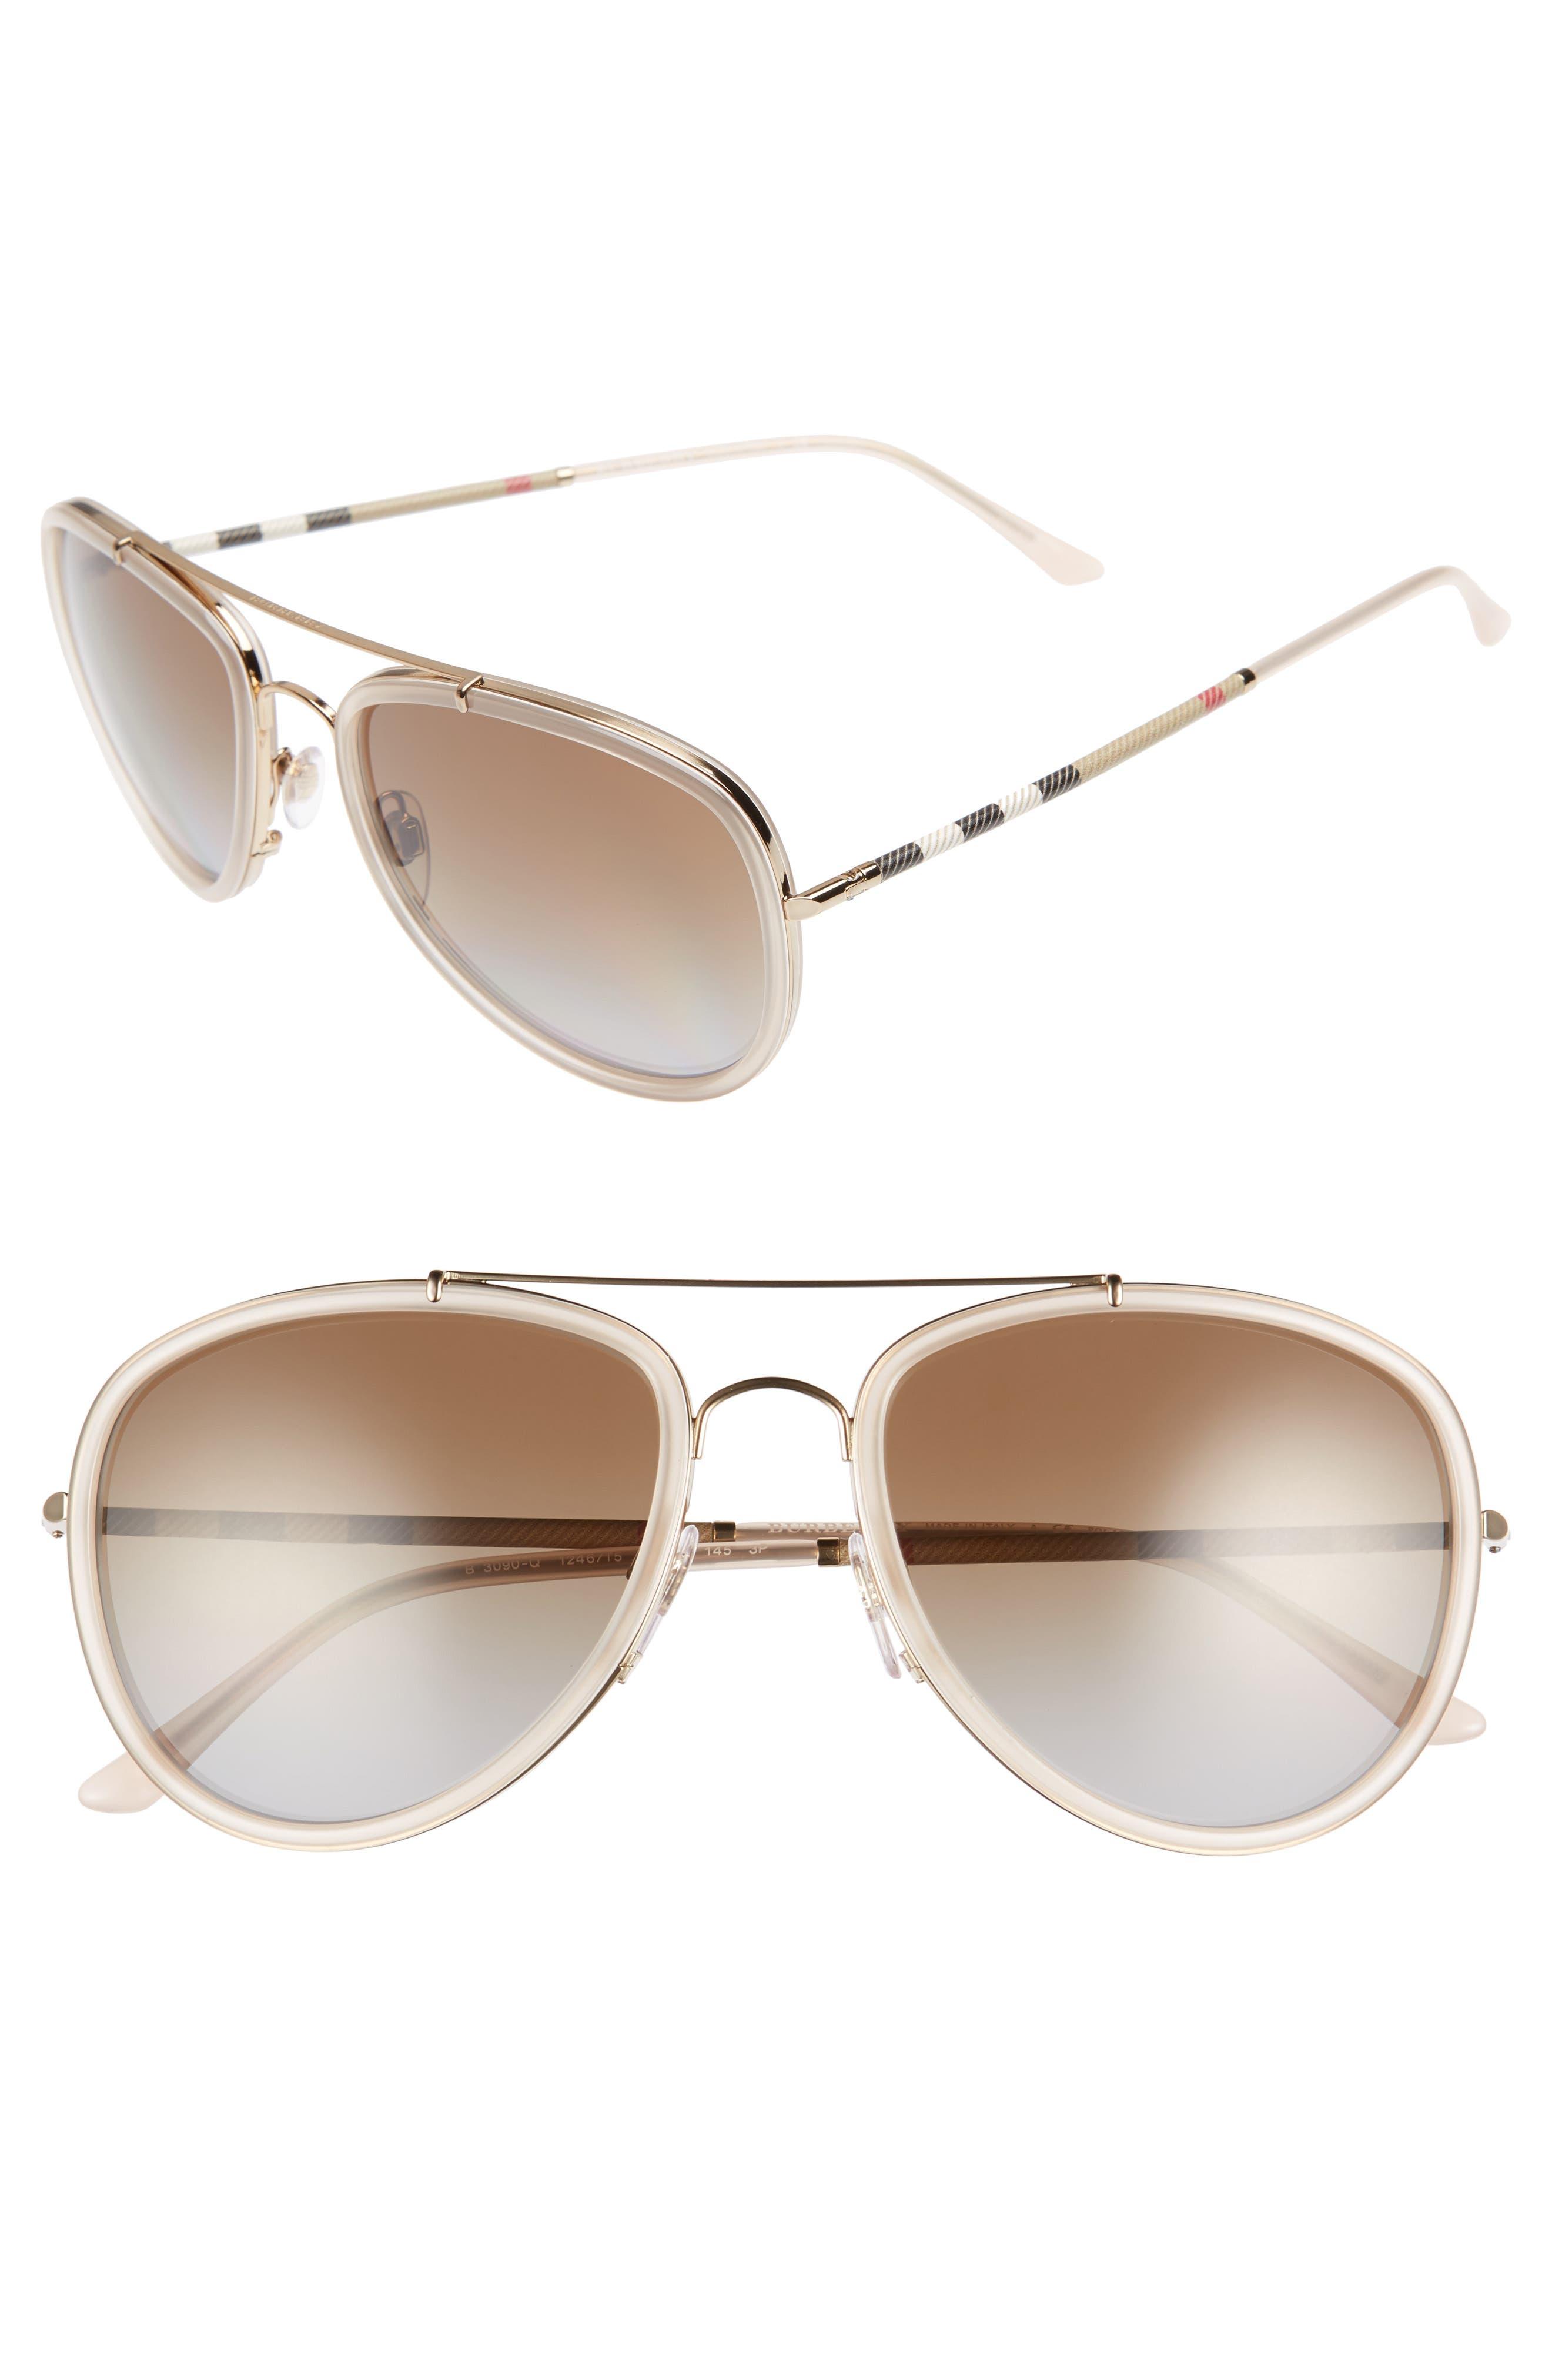 Burberry 58mm Check Temple Pilot Sunglasses